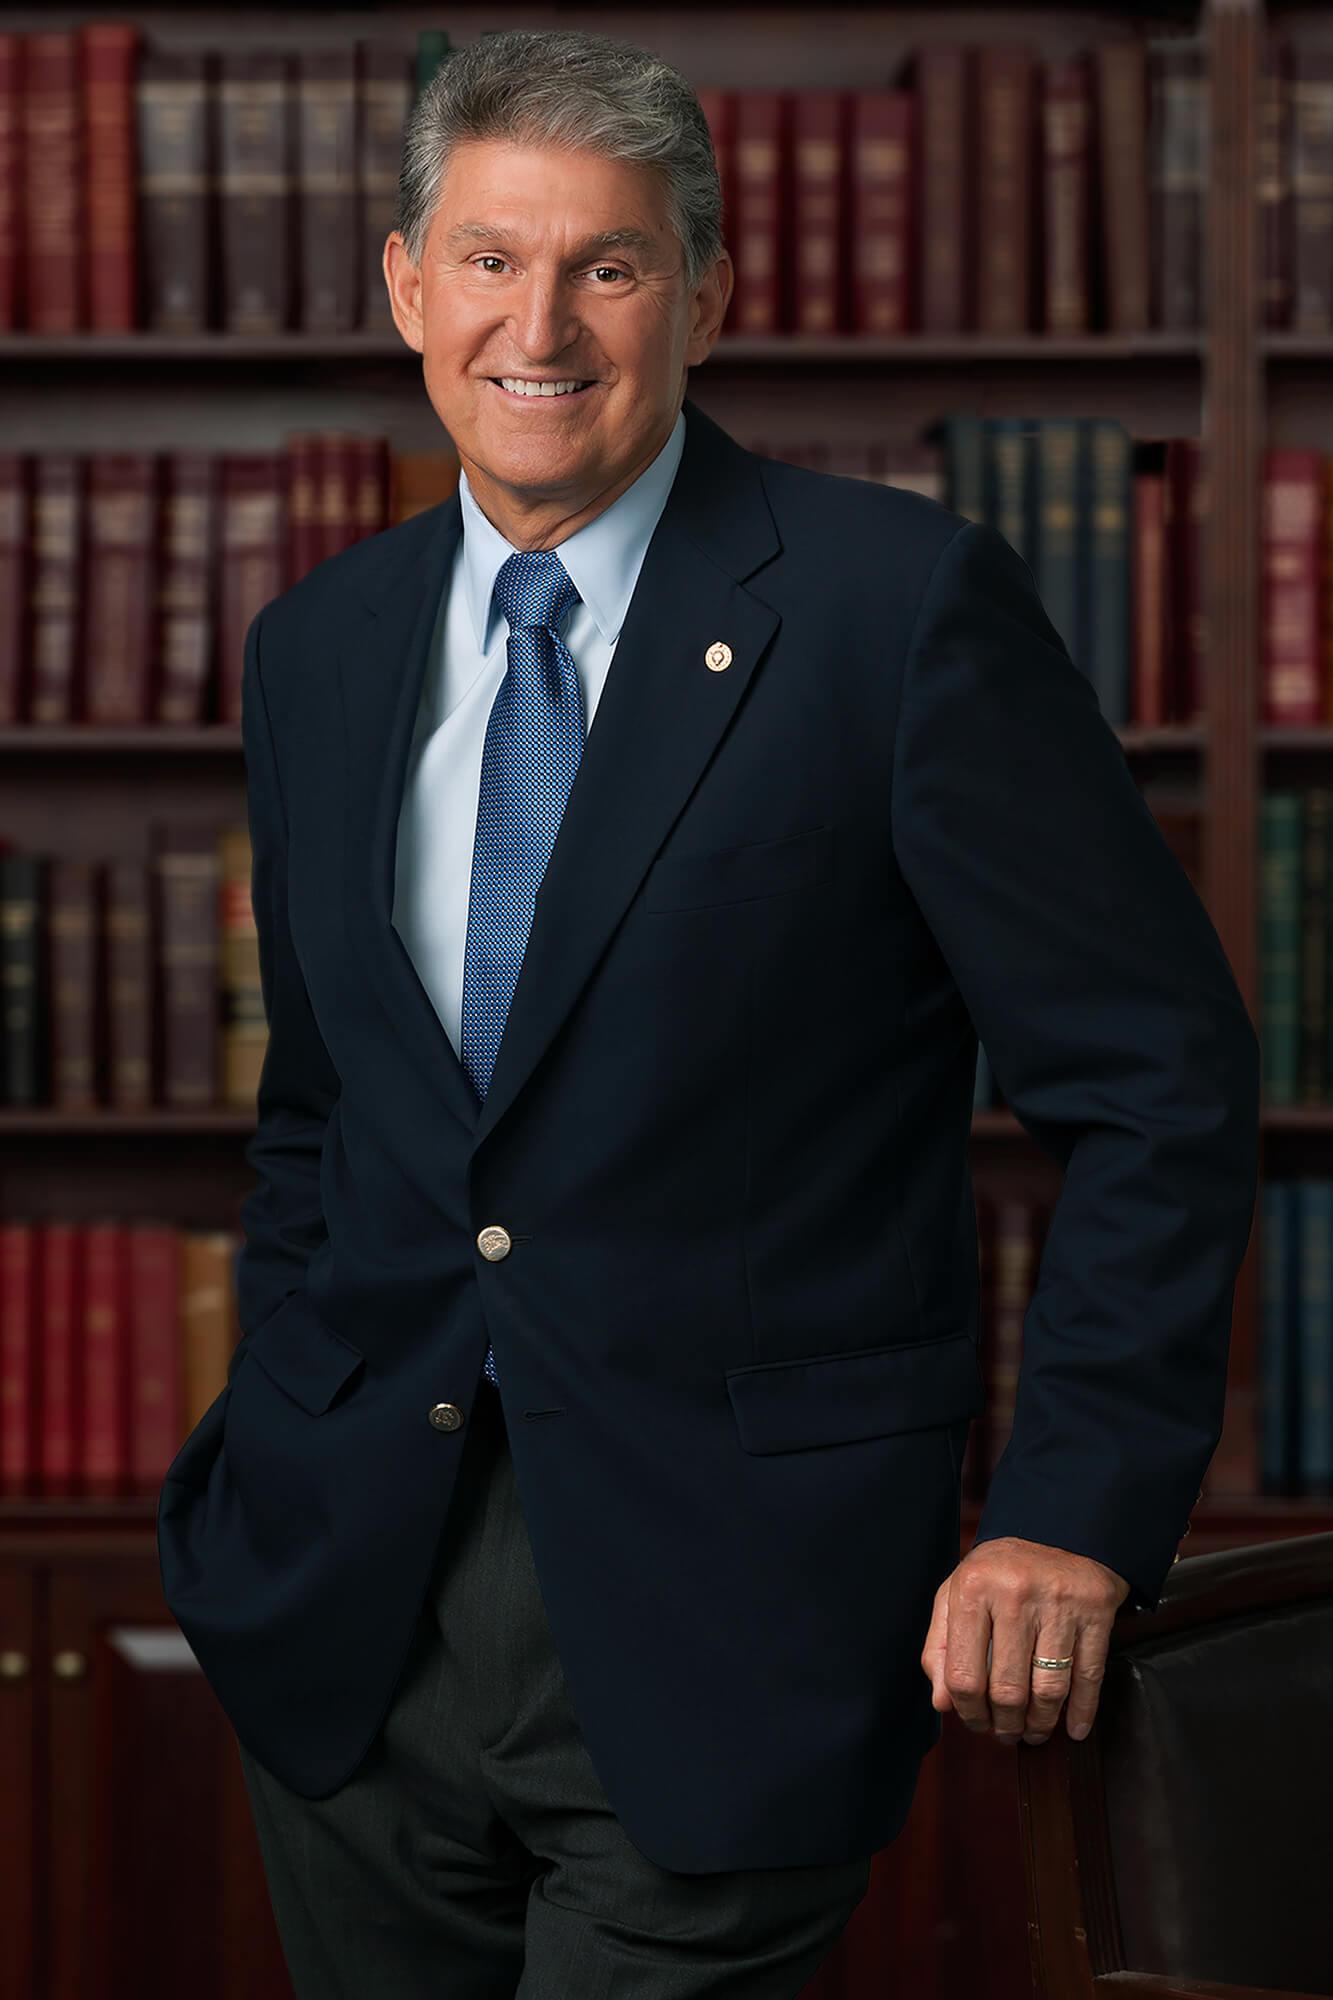 Sen. Joe Manchin (D-W.Va.)